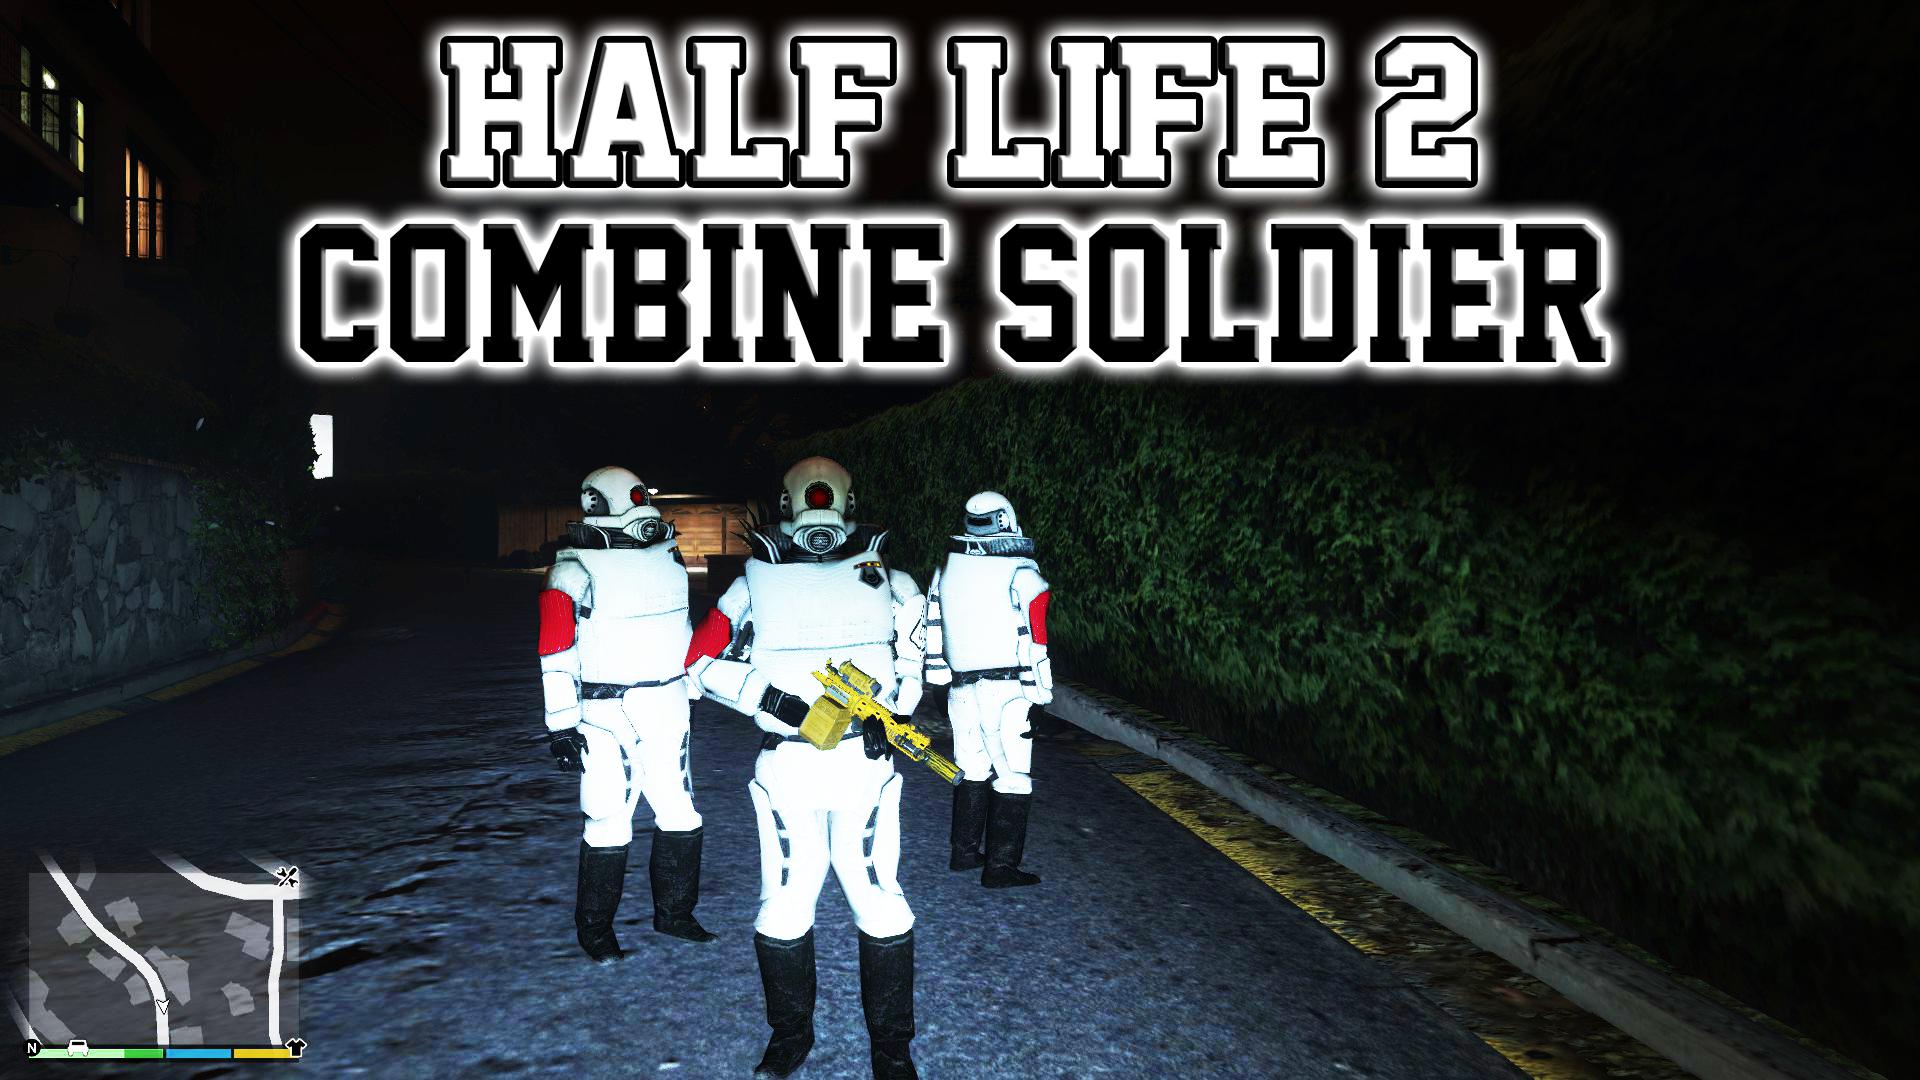 Half Life 2 Combine Elite Soldier Gta5 Mods Com